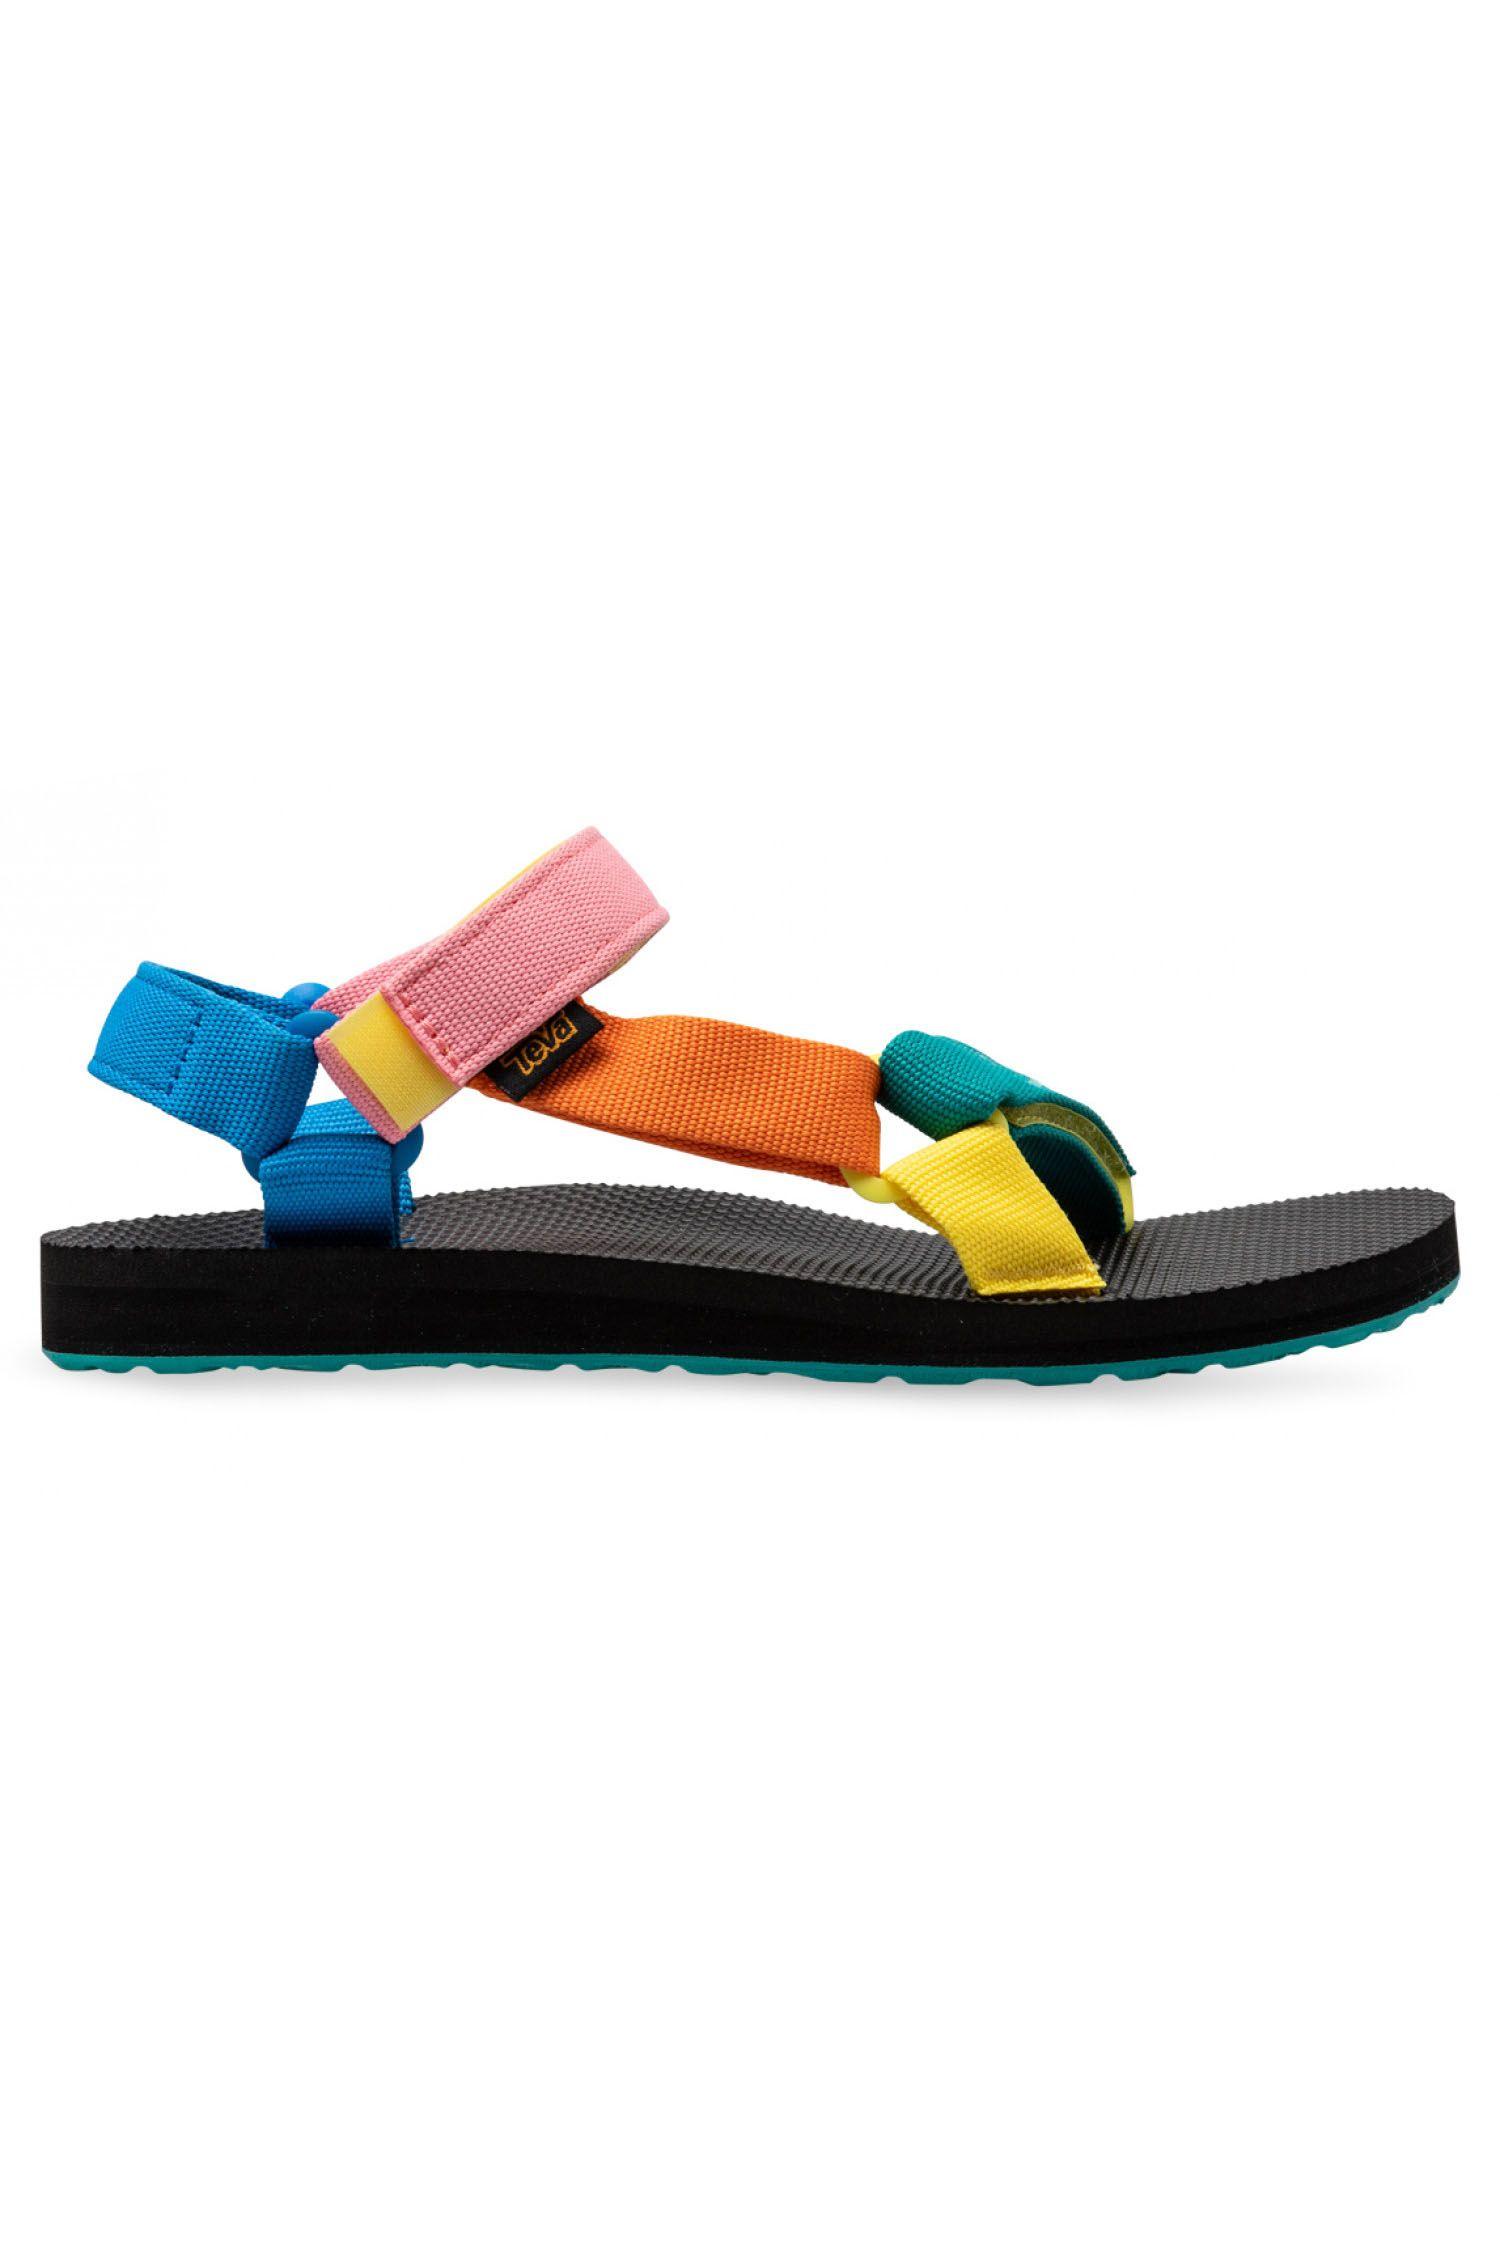 Teva Sandals ORIGINAL UNIVERSAL 90S Multi